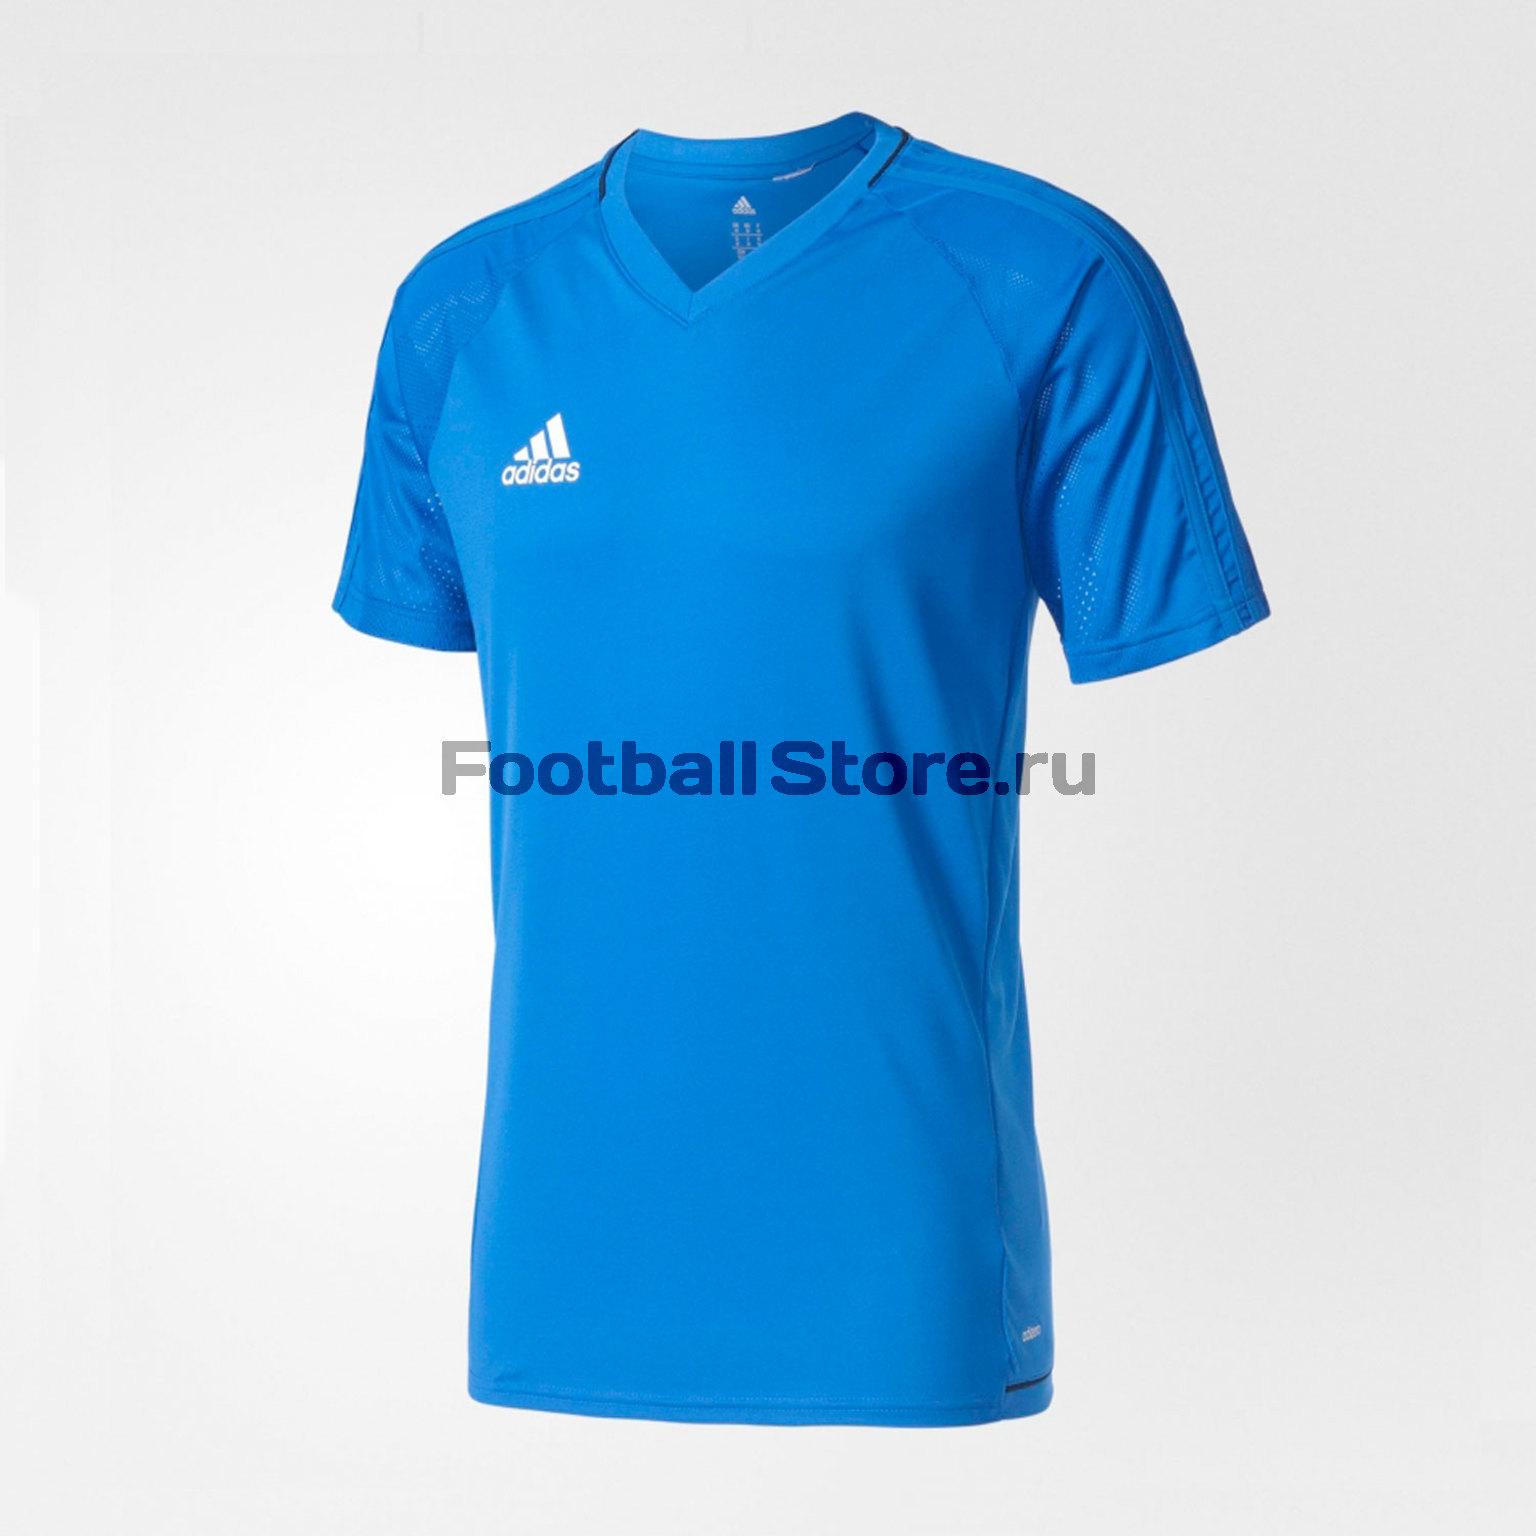 Футболка тренировочная Adidas Tiro17 Trg Jsy BQ2796